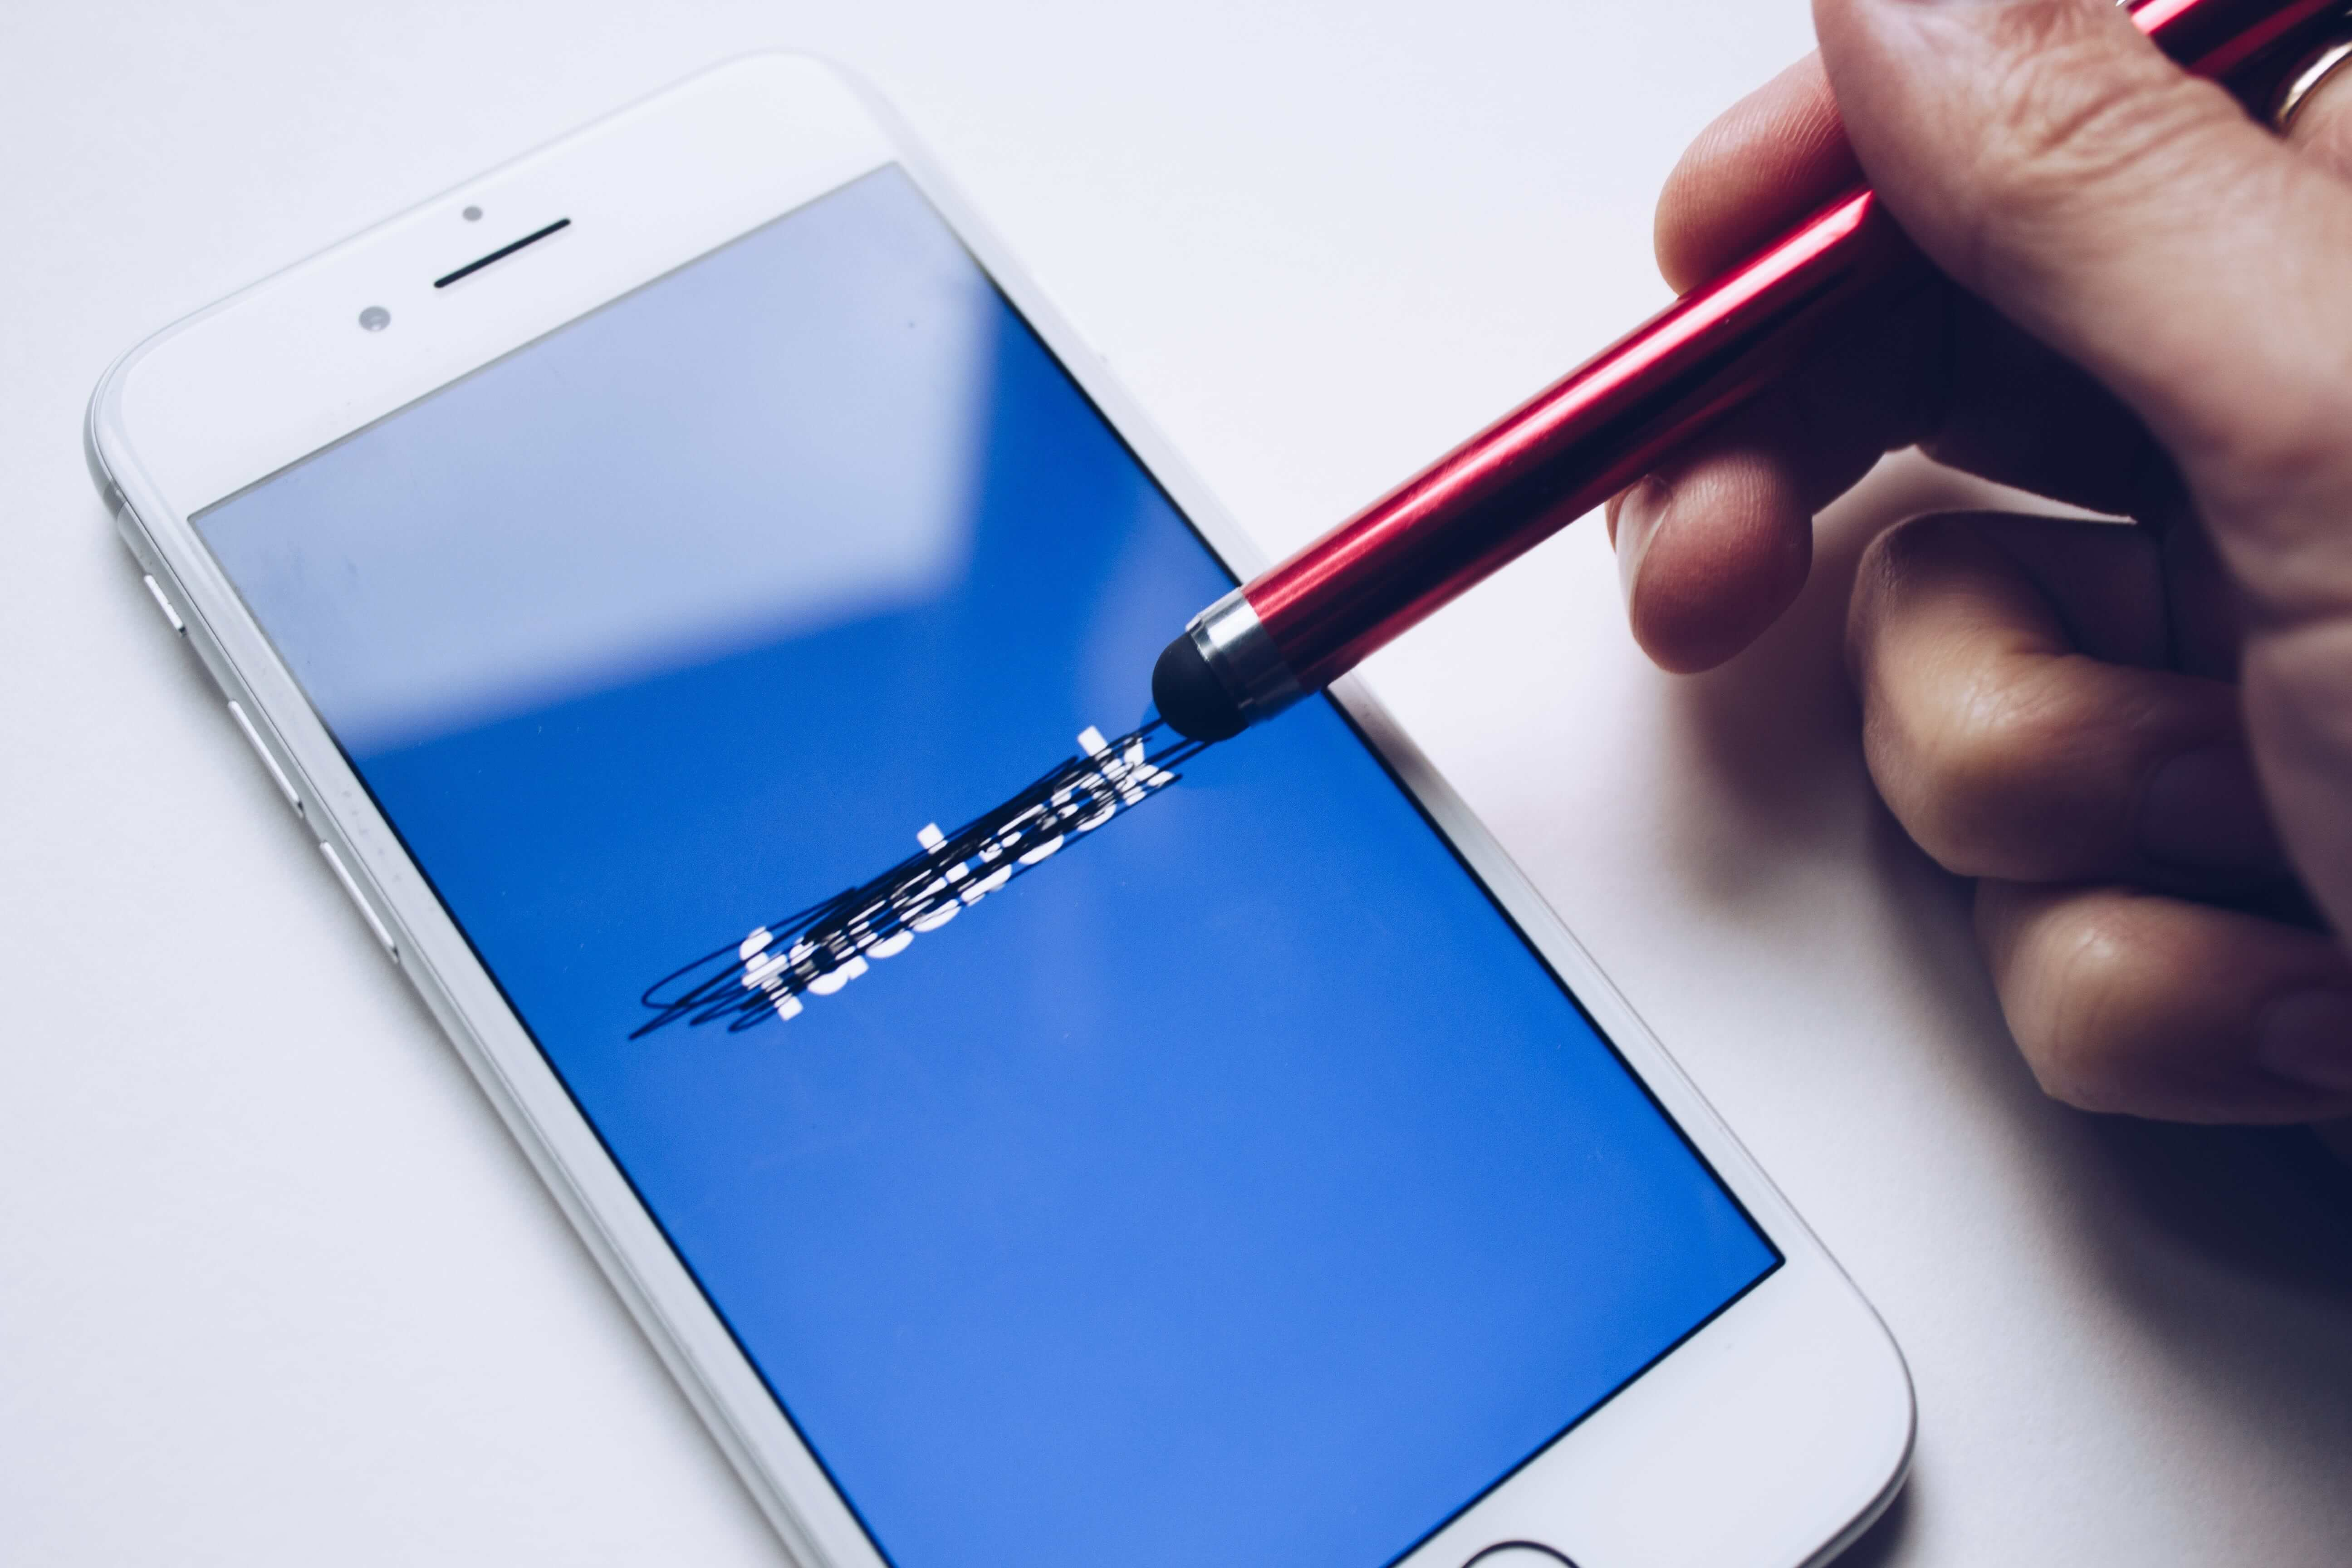 Estimating Facebook's Value